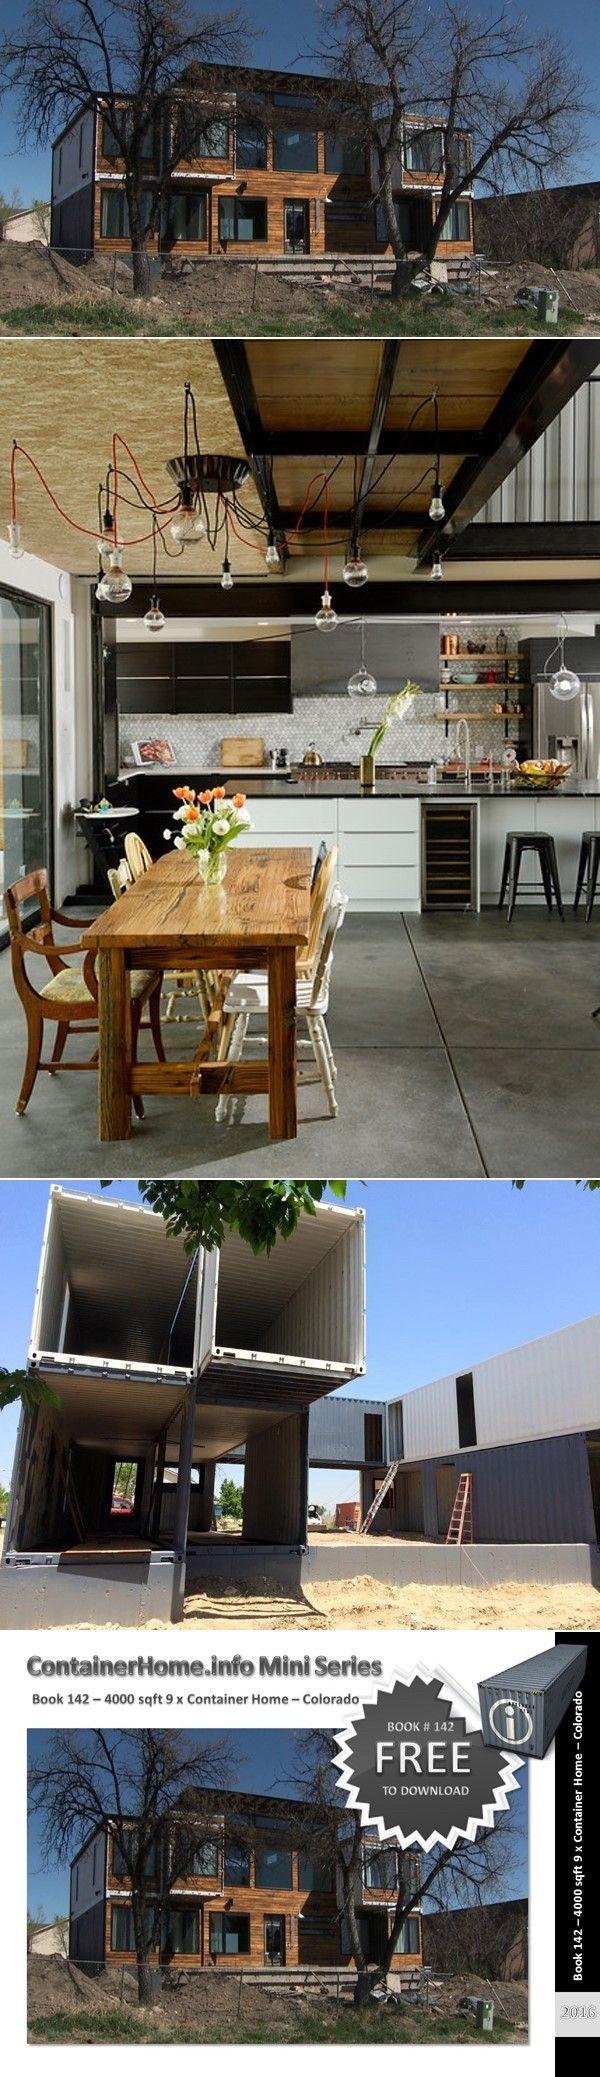 Home grill design bilder best  paint colors images on pinterest  home ideas house siding